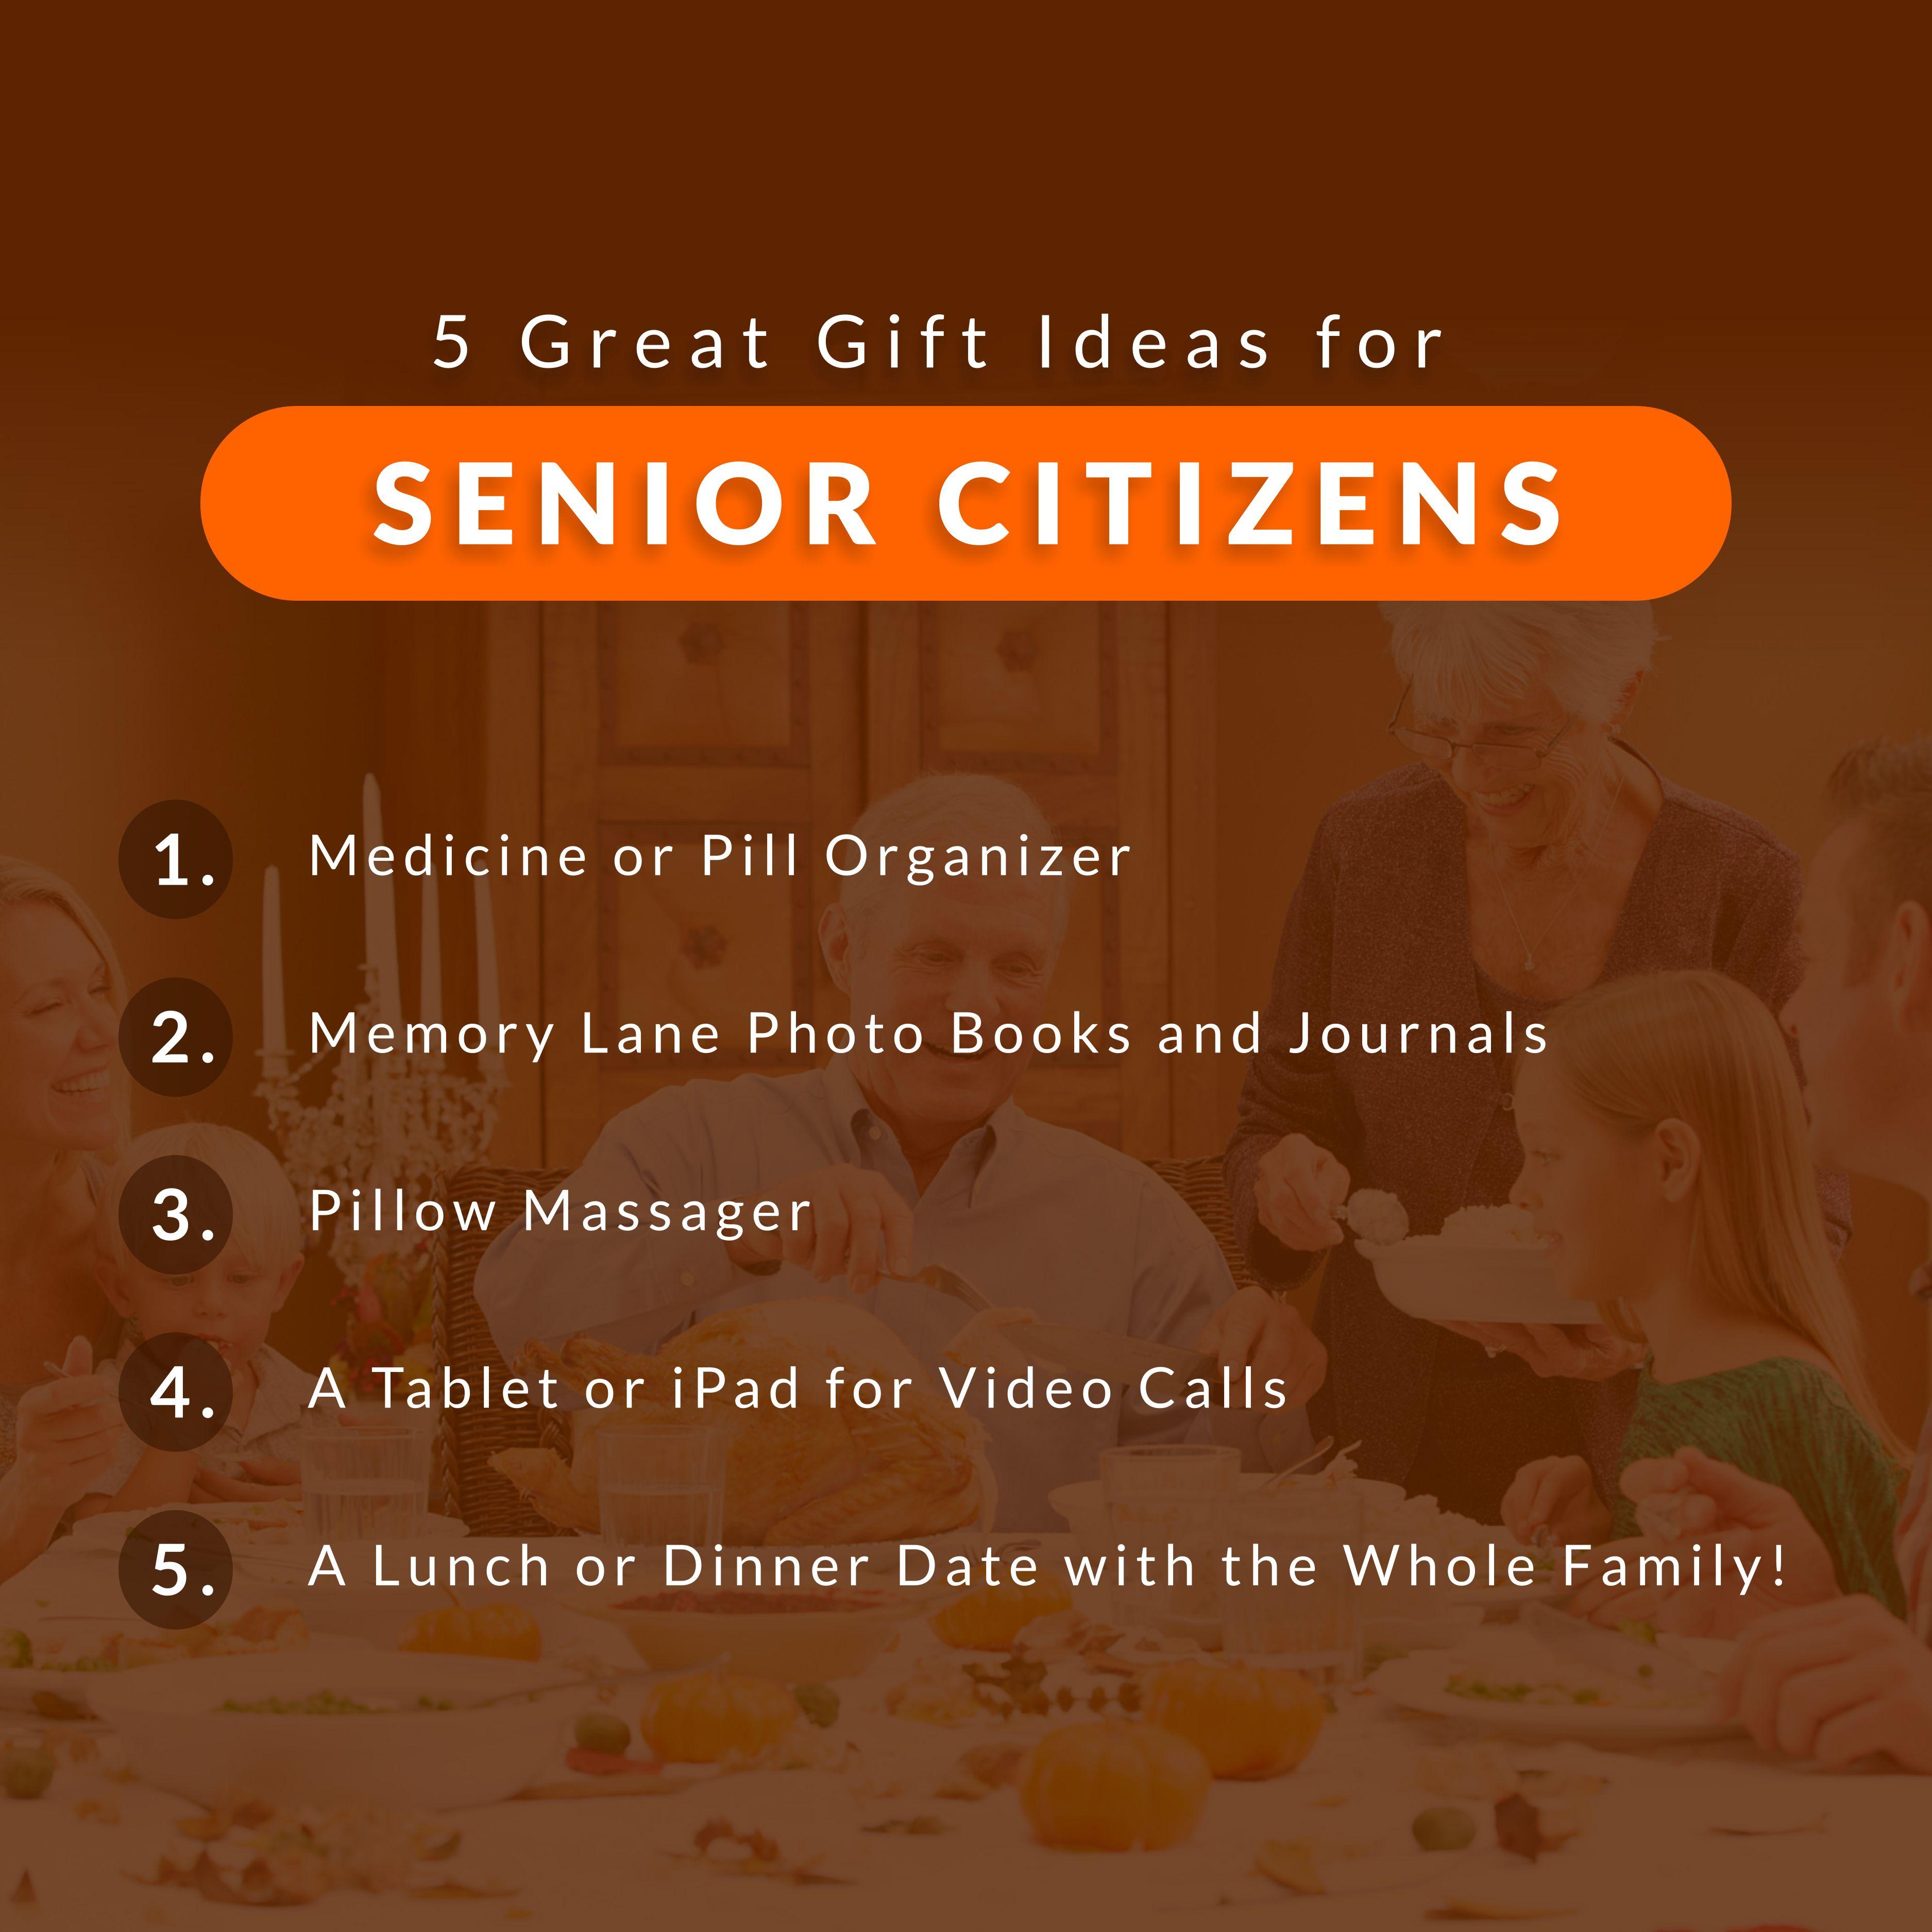 5 great gift ideas for senior citizens seniors gifts